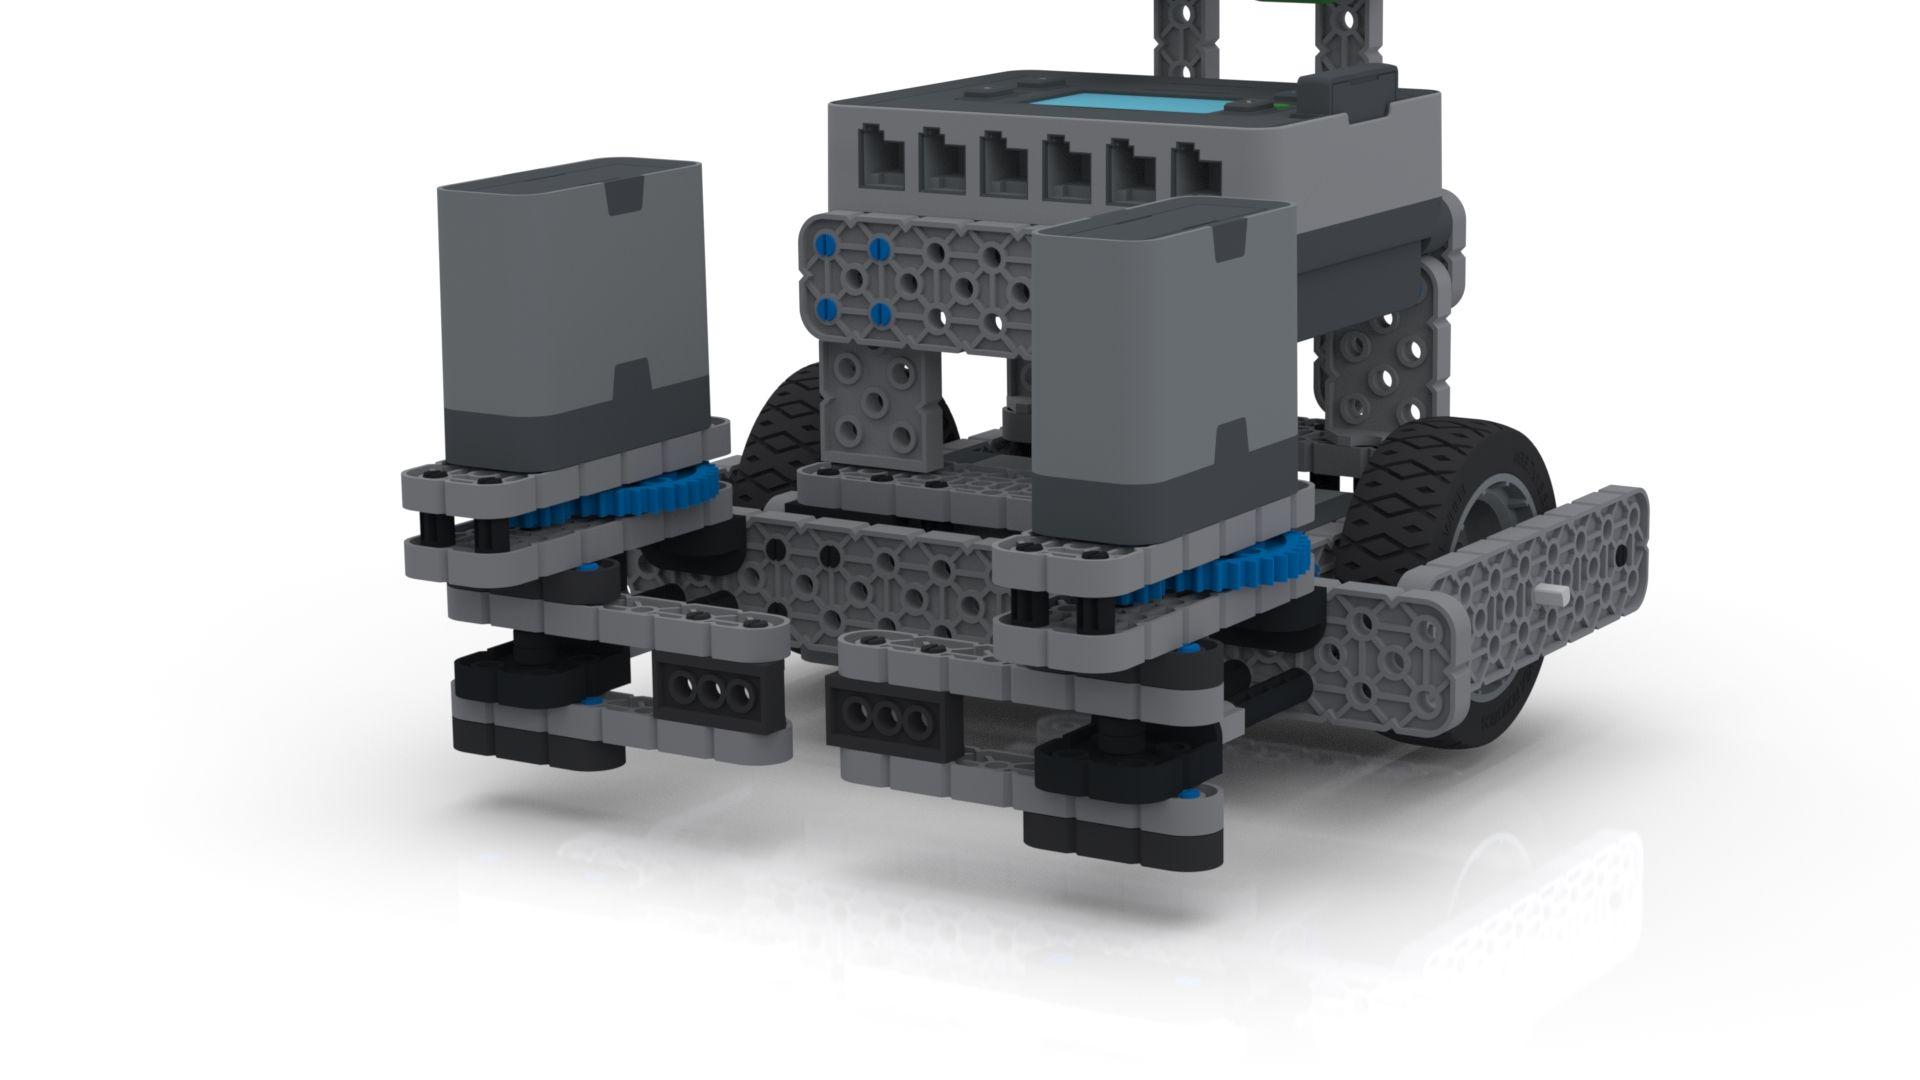 Fabrica-de-nerdes-vex-iq-lucas6-3500-3500